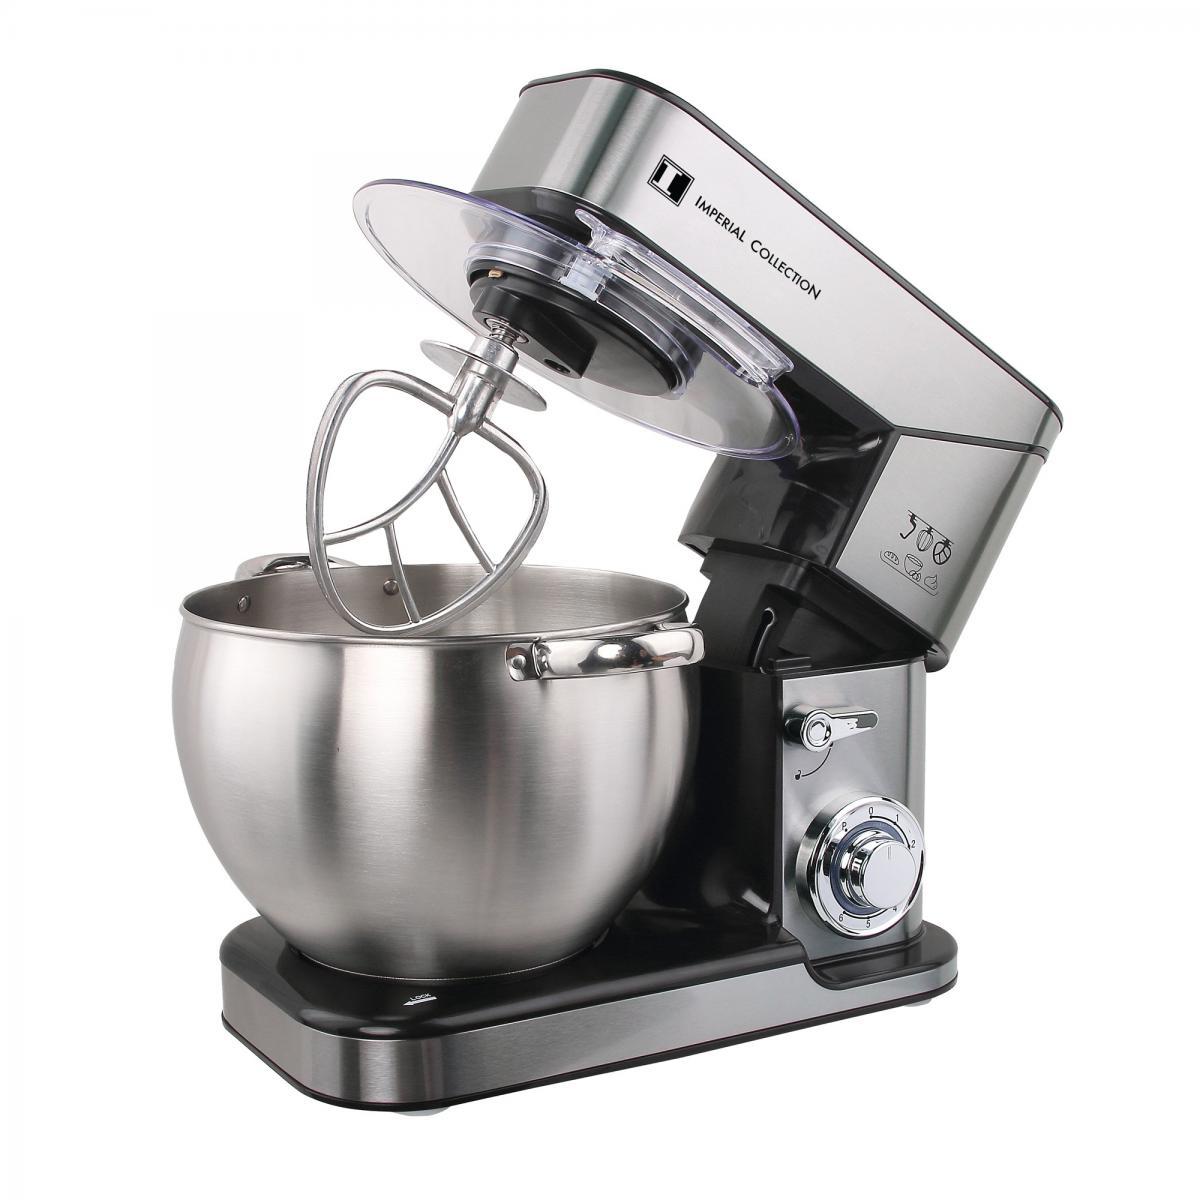 Imperial Collection Imperial Collection IM-KM2500: Robot de cuisine